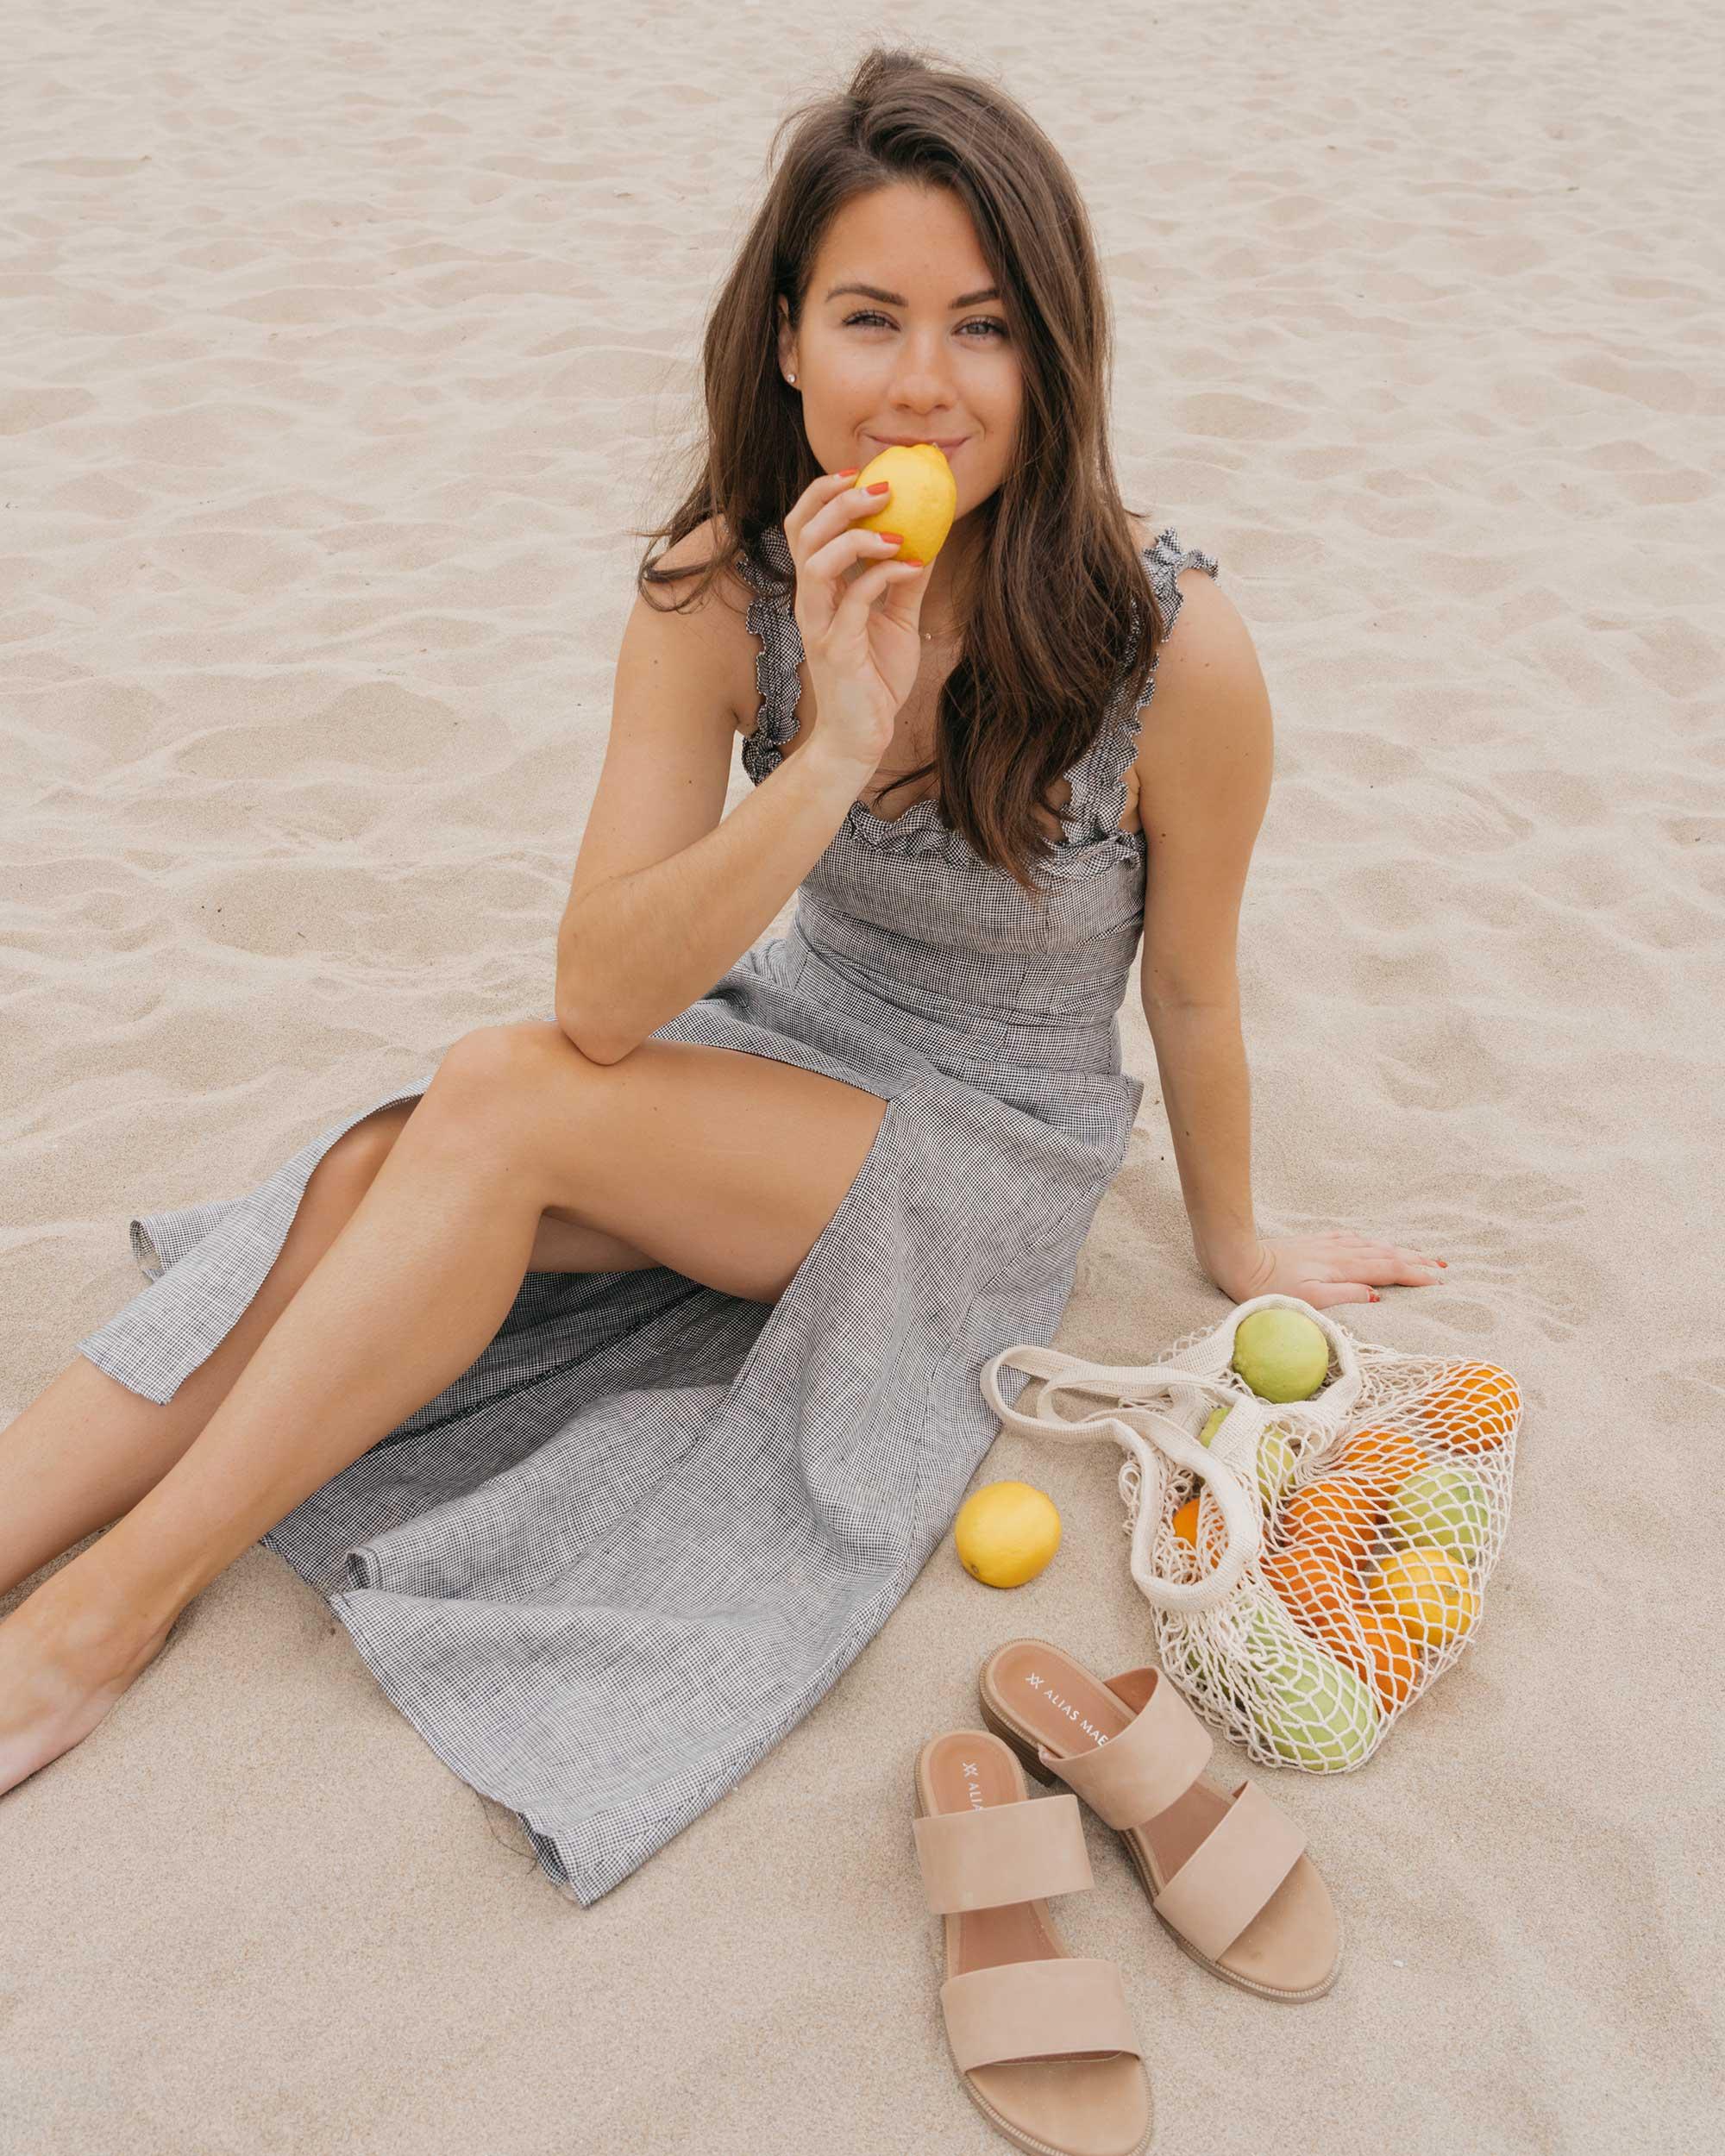 Reformation Lavendar Midi Dress Cotton Net Shopping Tote Newport Beach California Summer Outfit8.jpg